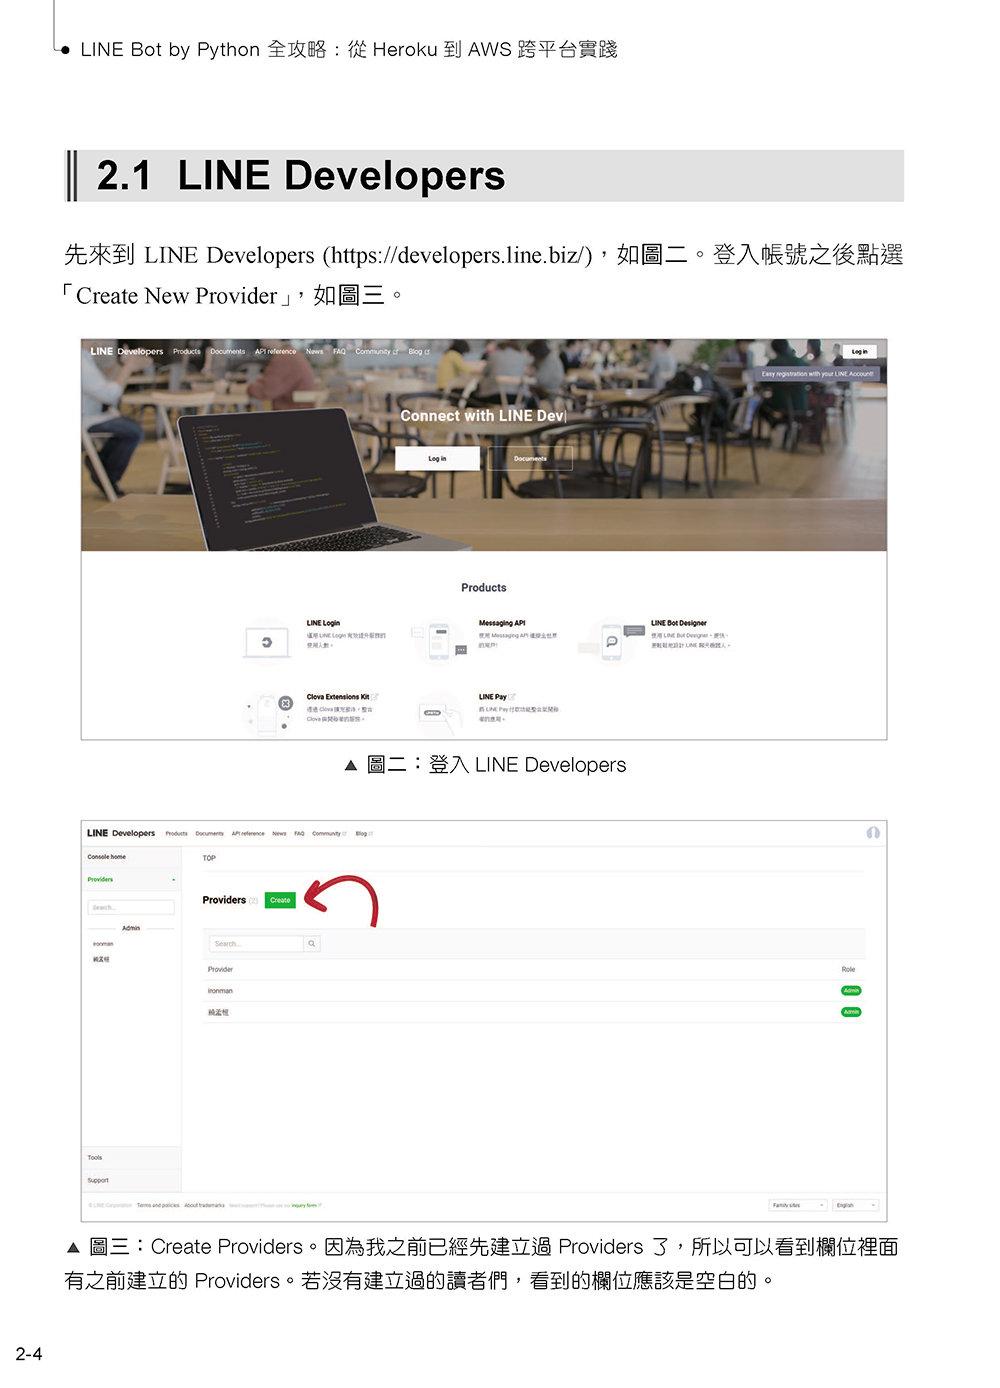 LINE Bot by Python 全攻略:從 Heroku 到 AWS 跨平台實踐 (iT邦幫忙鐵人賽系列書)-preview-4